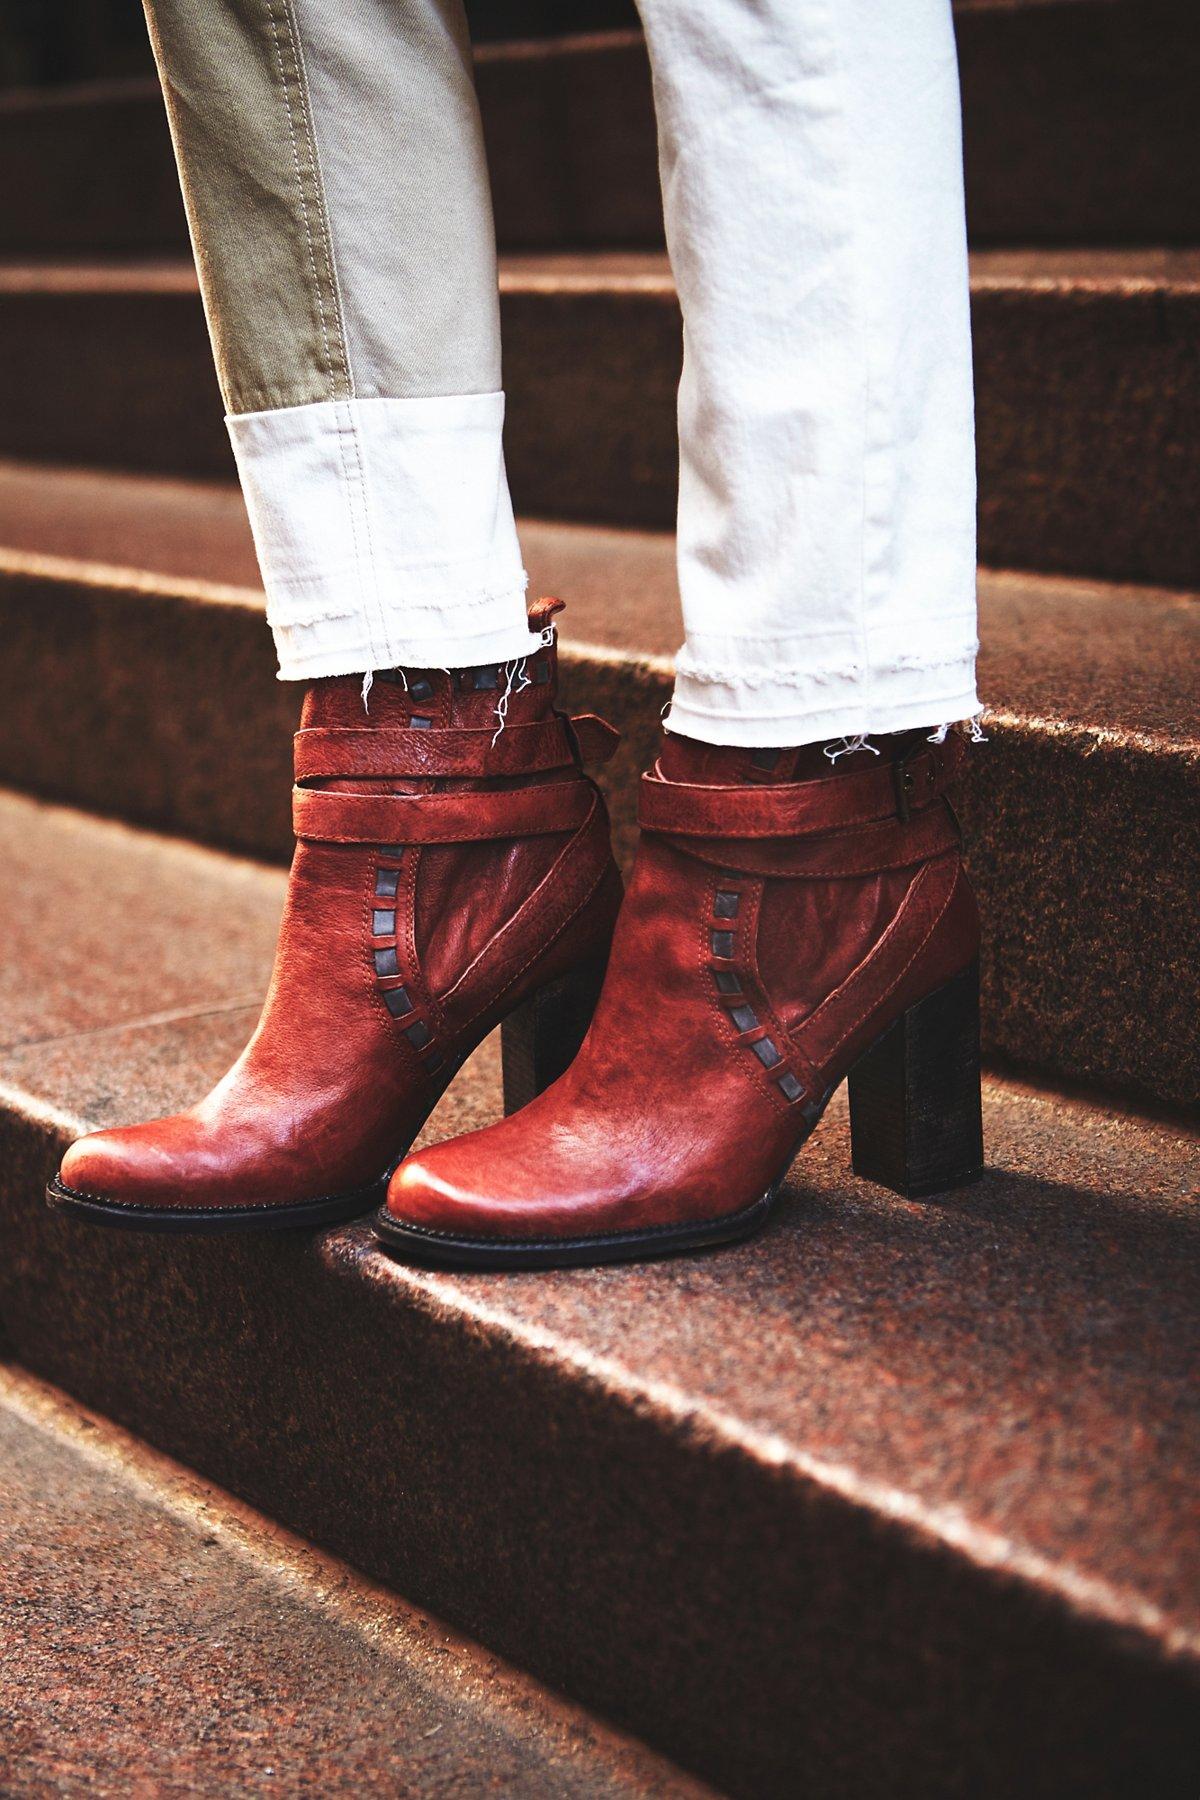 Heirloom高跟靴